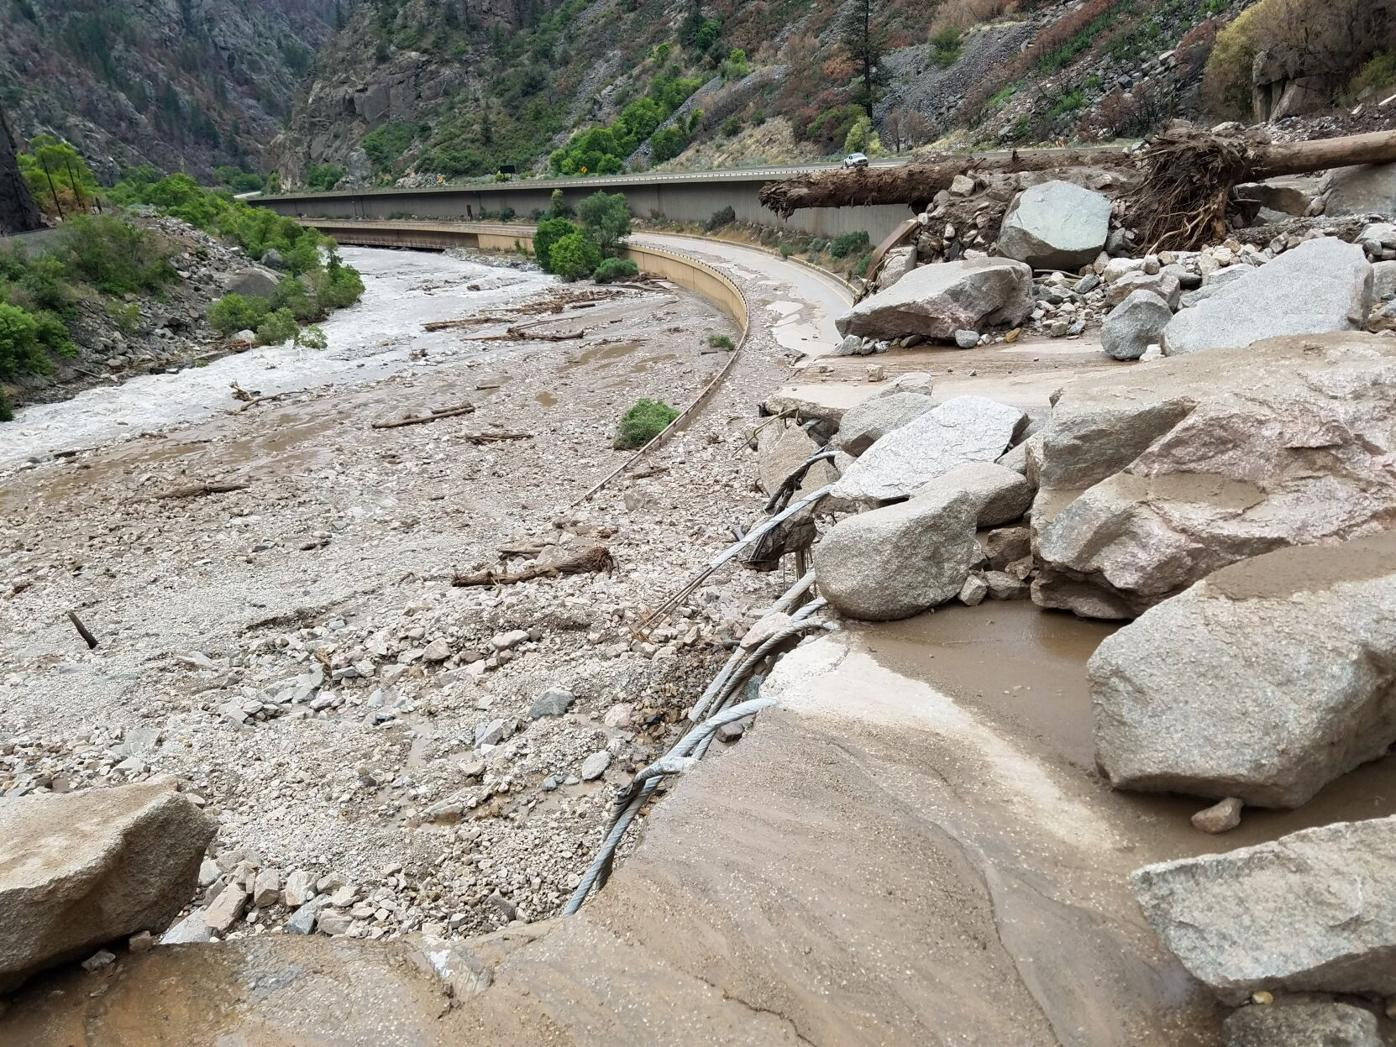 I-70 Damage from Mudslides July 2021 (Photo) Courtesy Colorado Department of Transportation